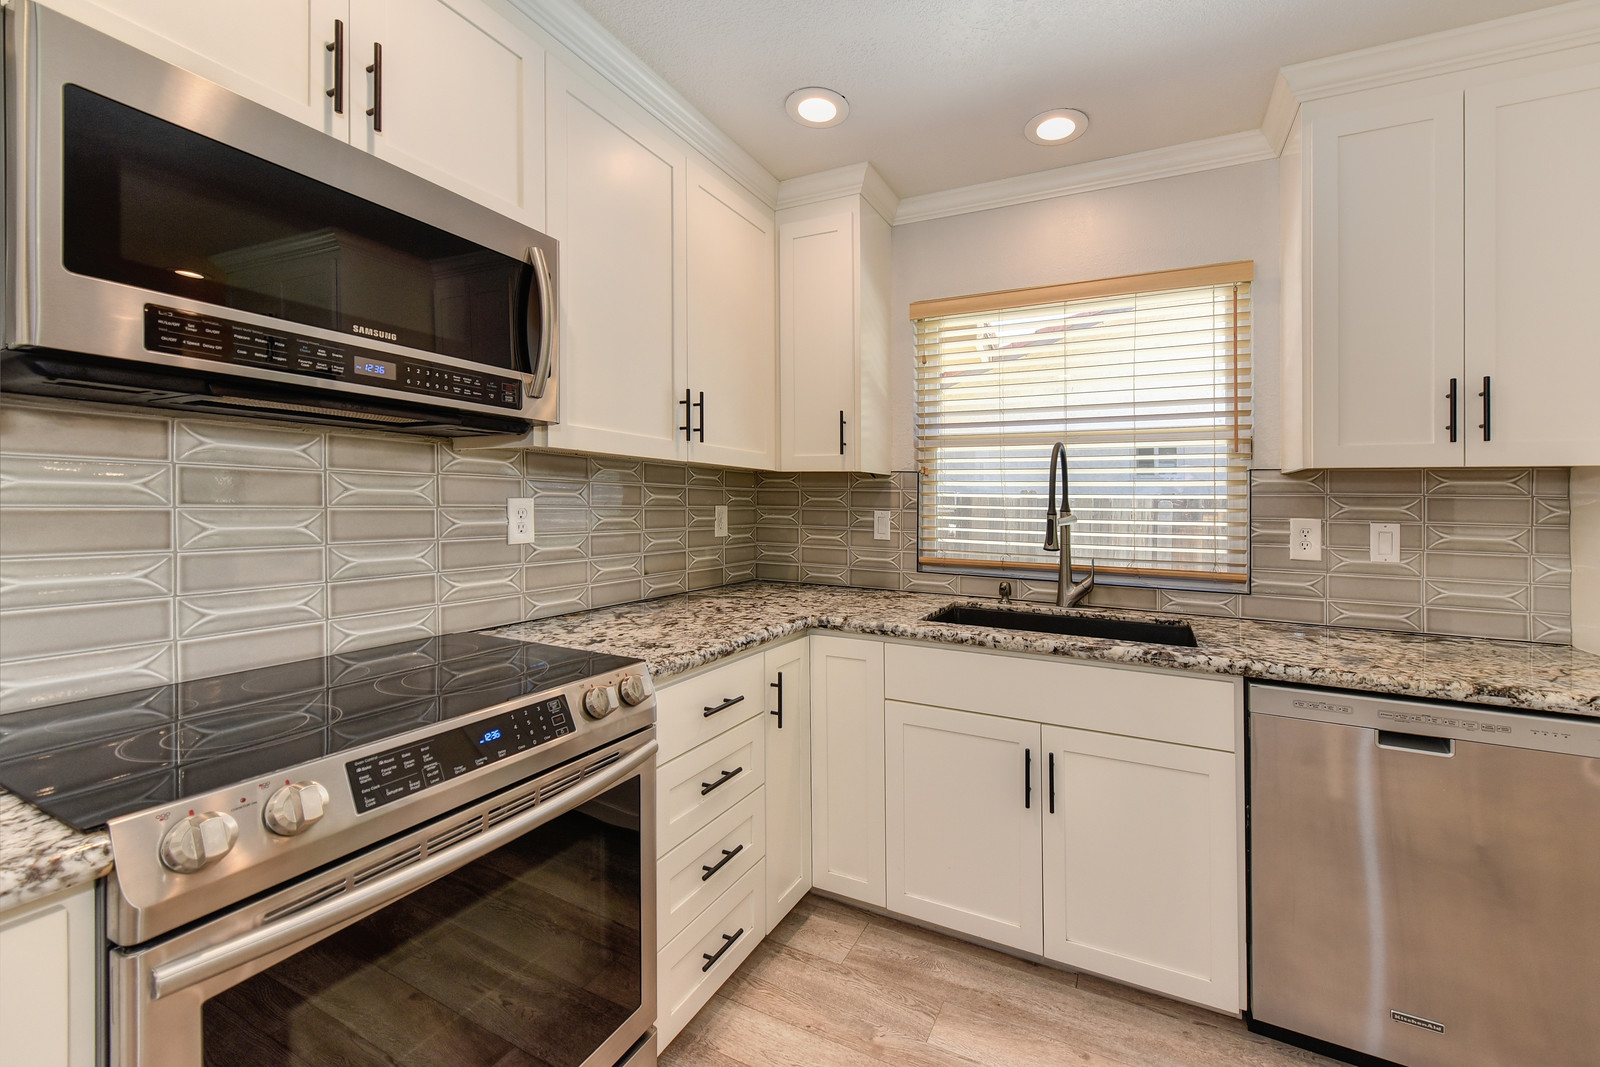 5342 Nyoda Way remodeled kitchen | Keller Williams Realty Carmichael California